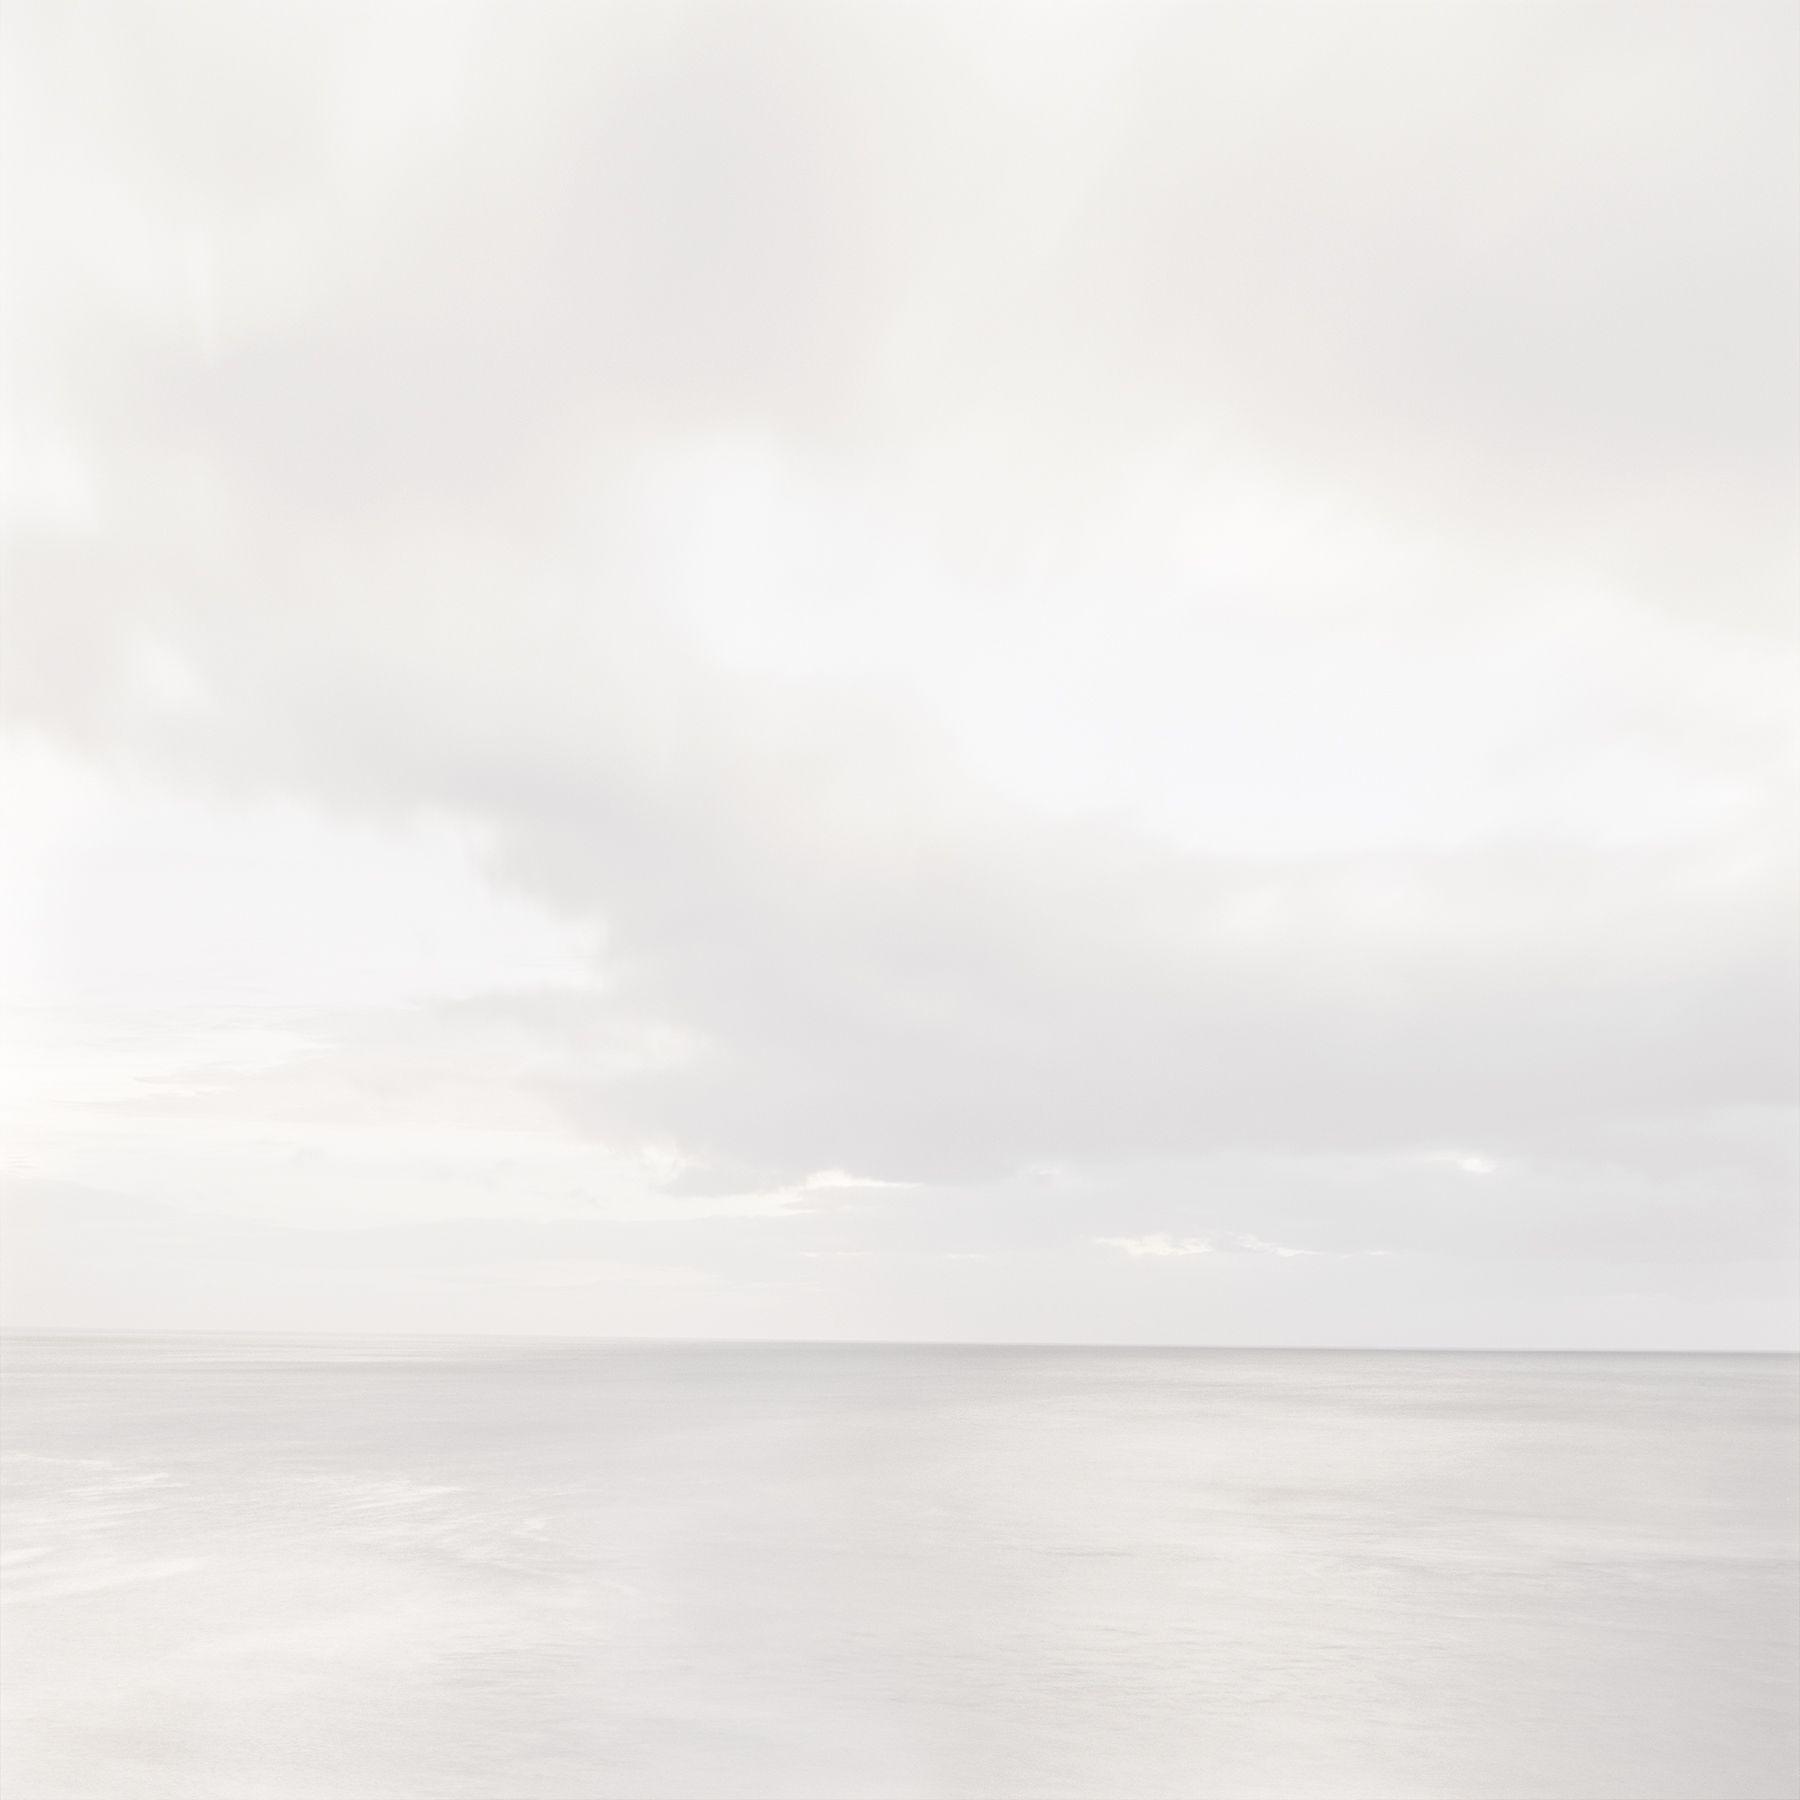 Oceanscap Z, Archival Pigment Print